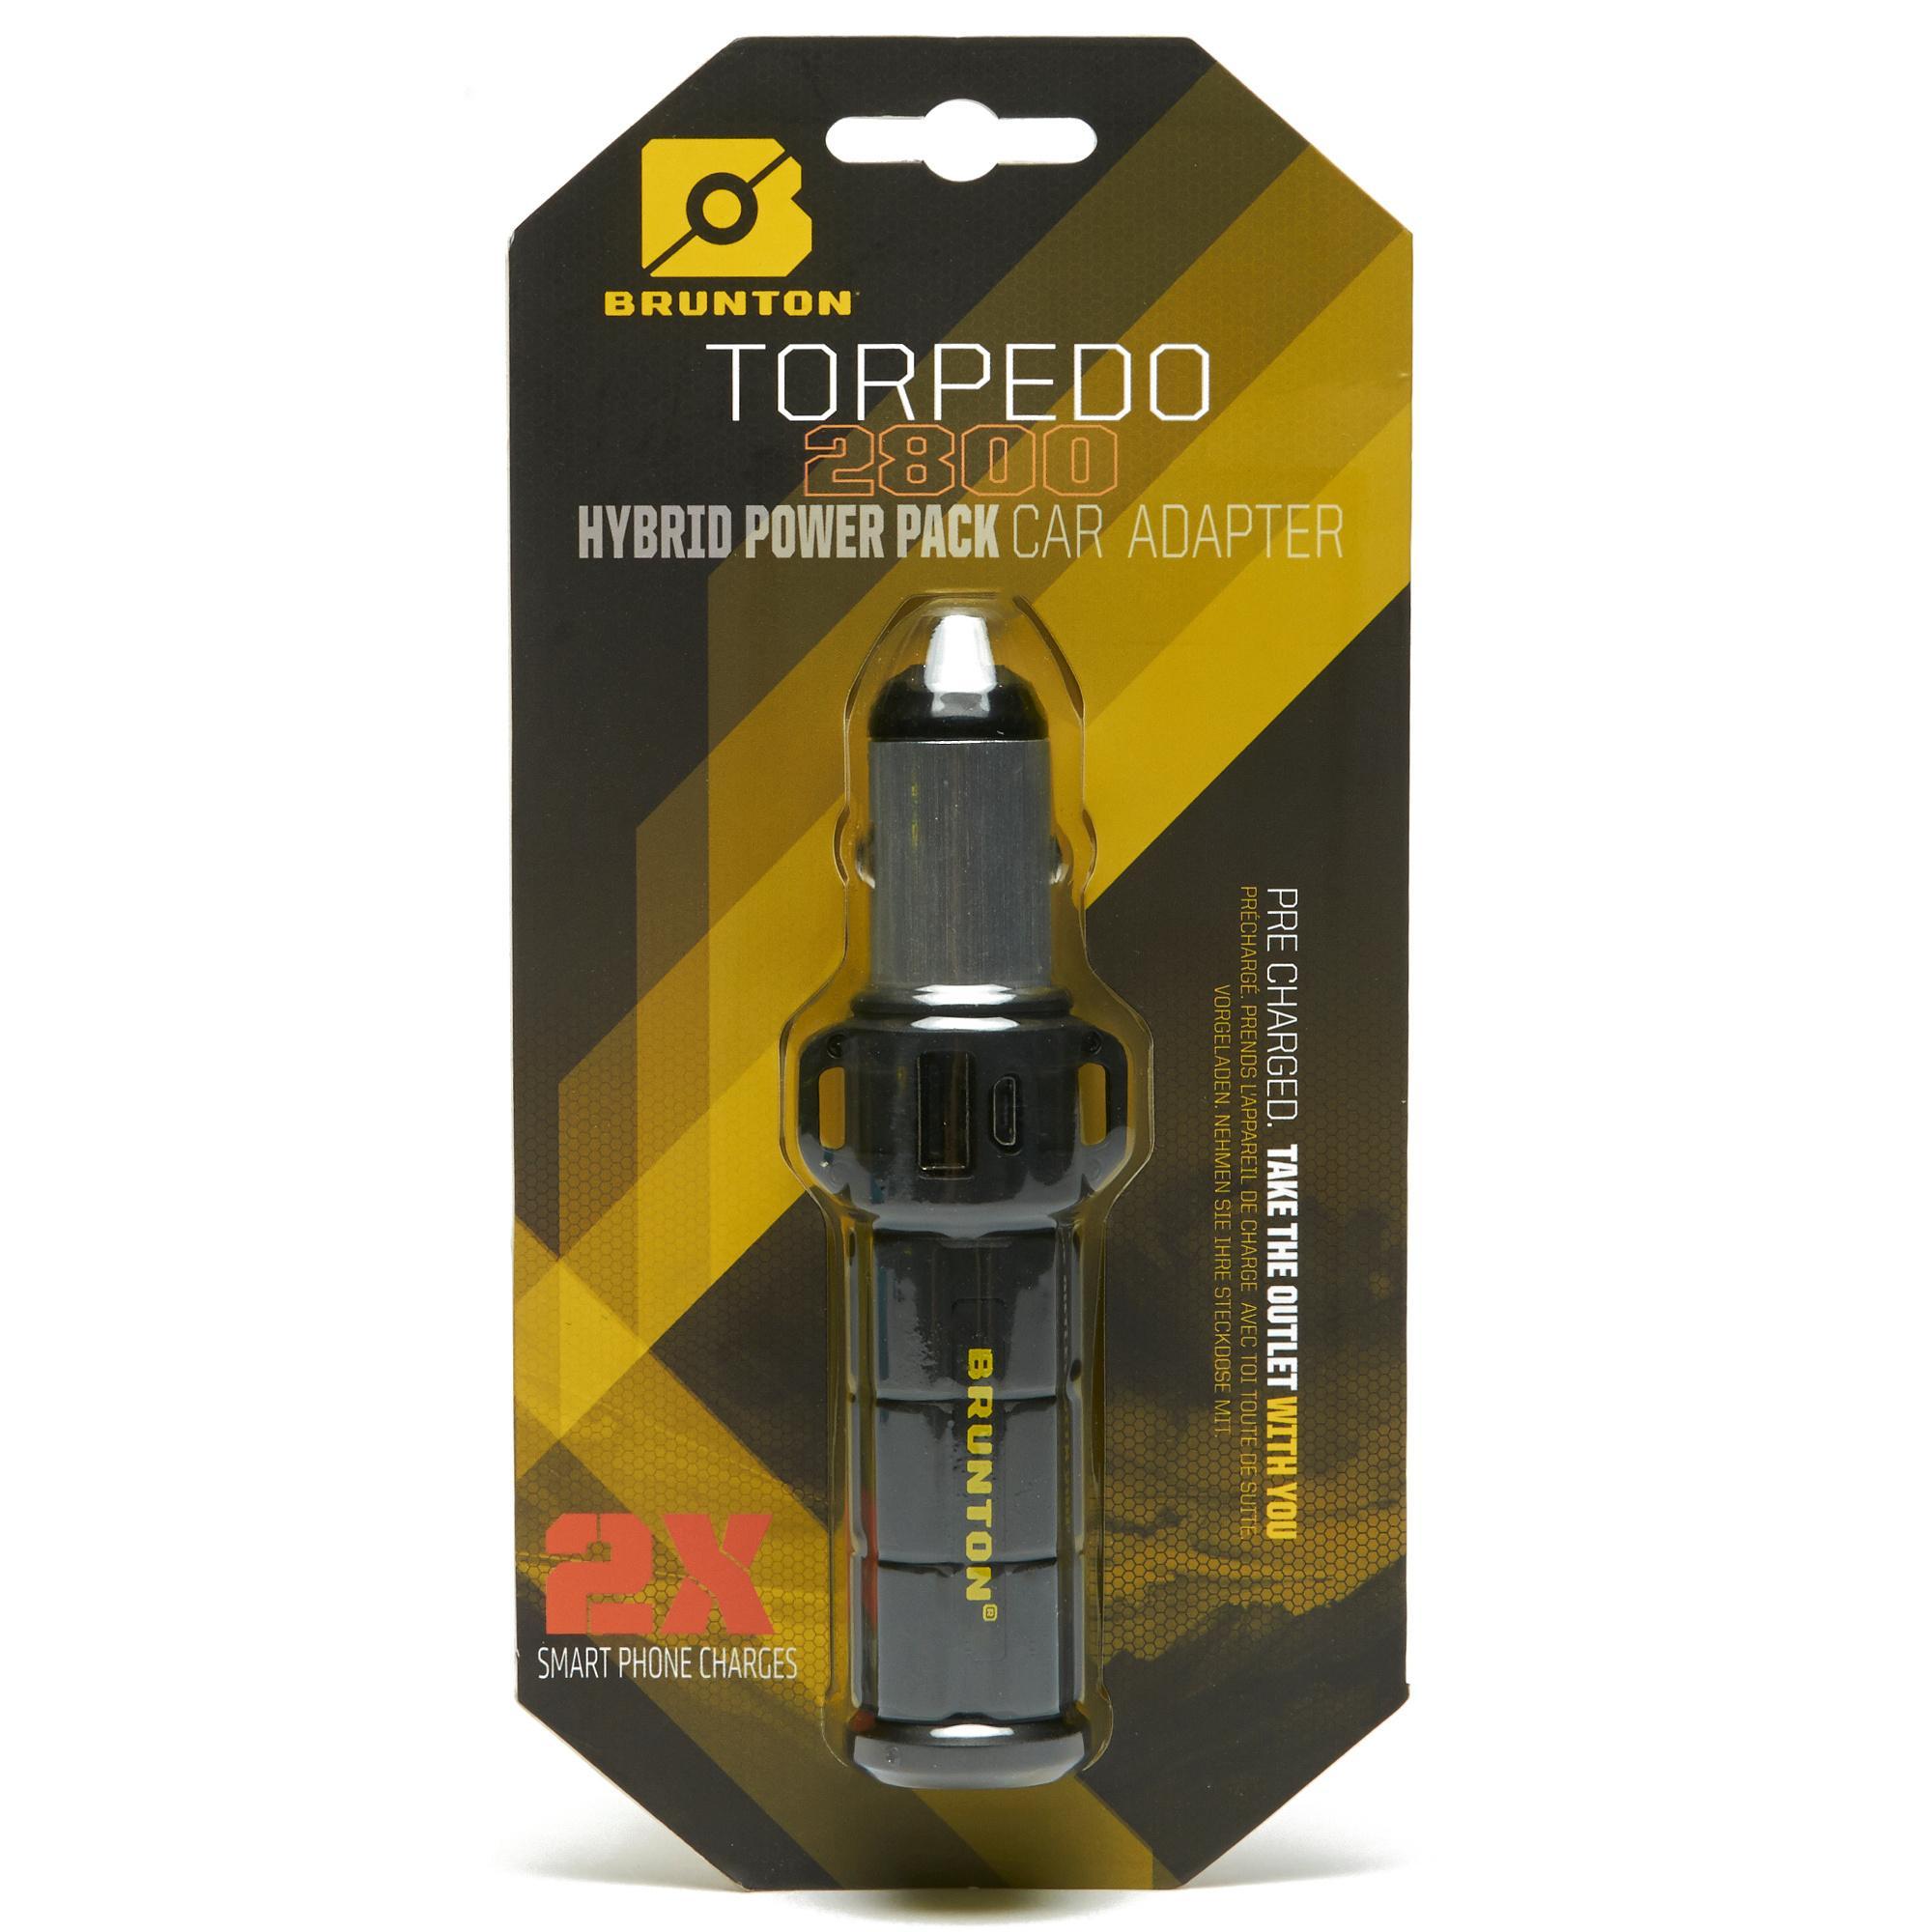 Brunton Torpedo 2800 Charger - Black, Black